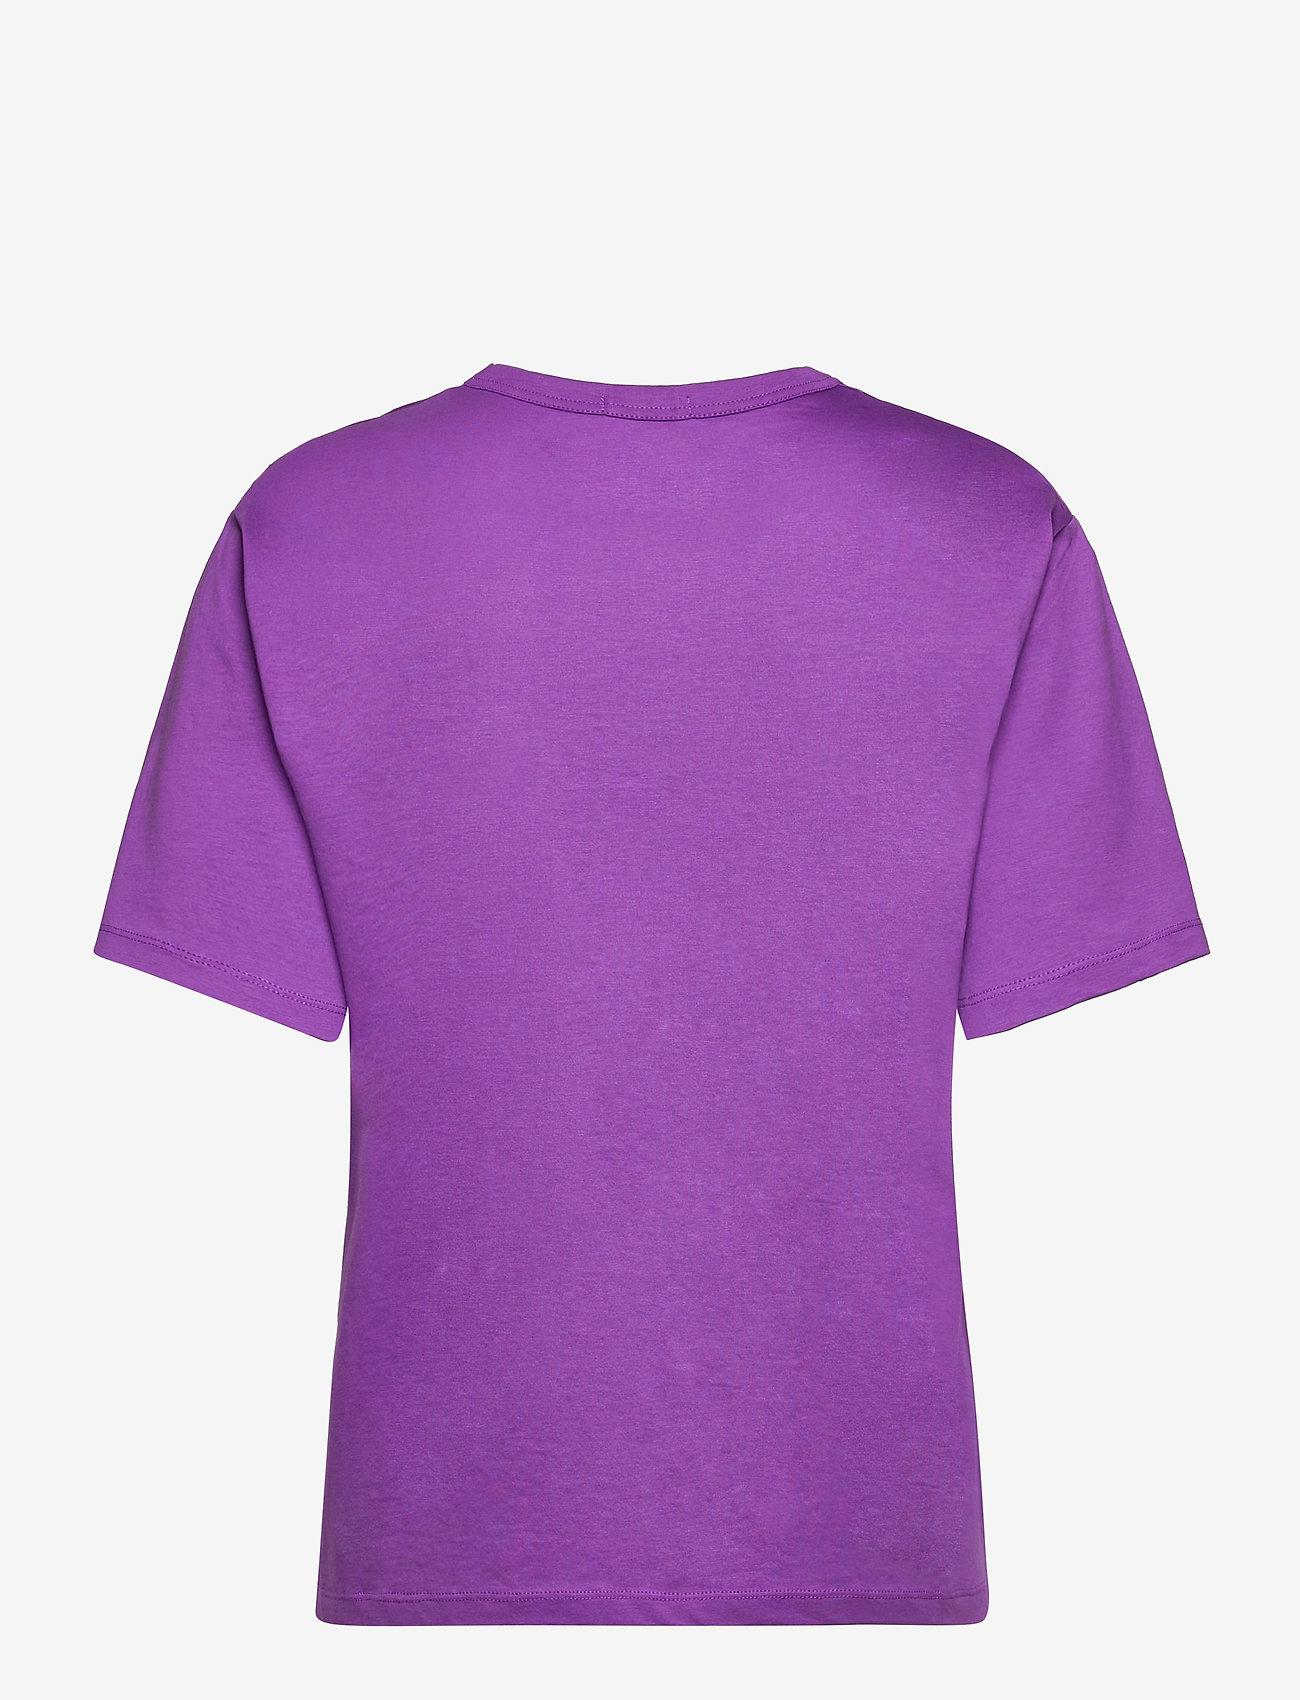 Marimekko - KAPINA LOGO T-SHIRT - t-shirts - purple, light peach - 1